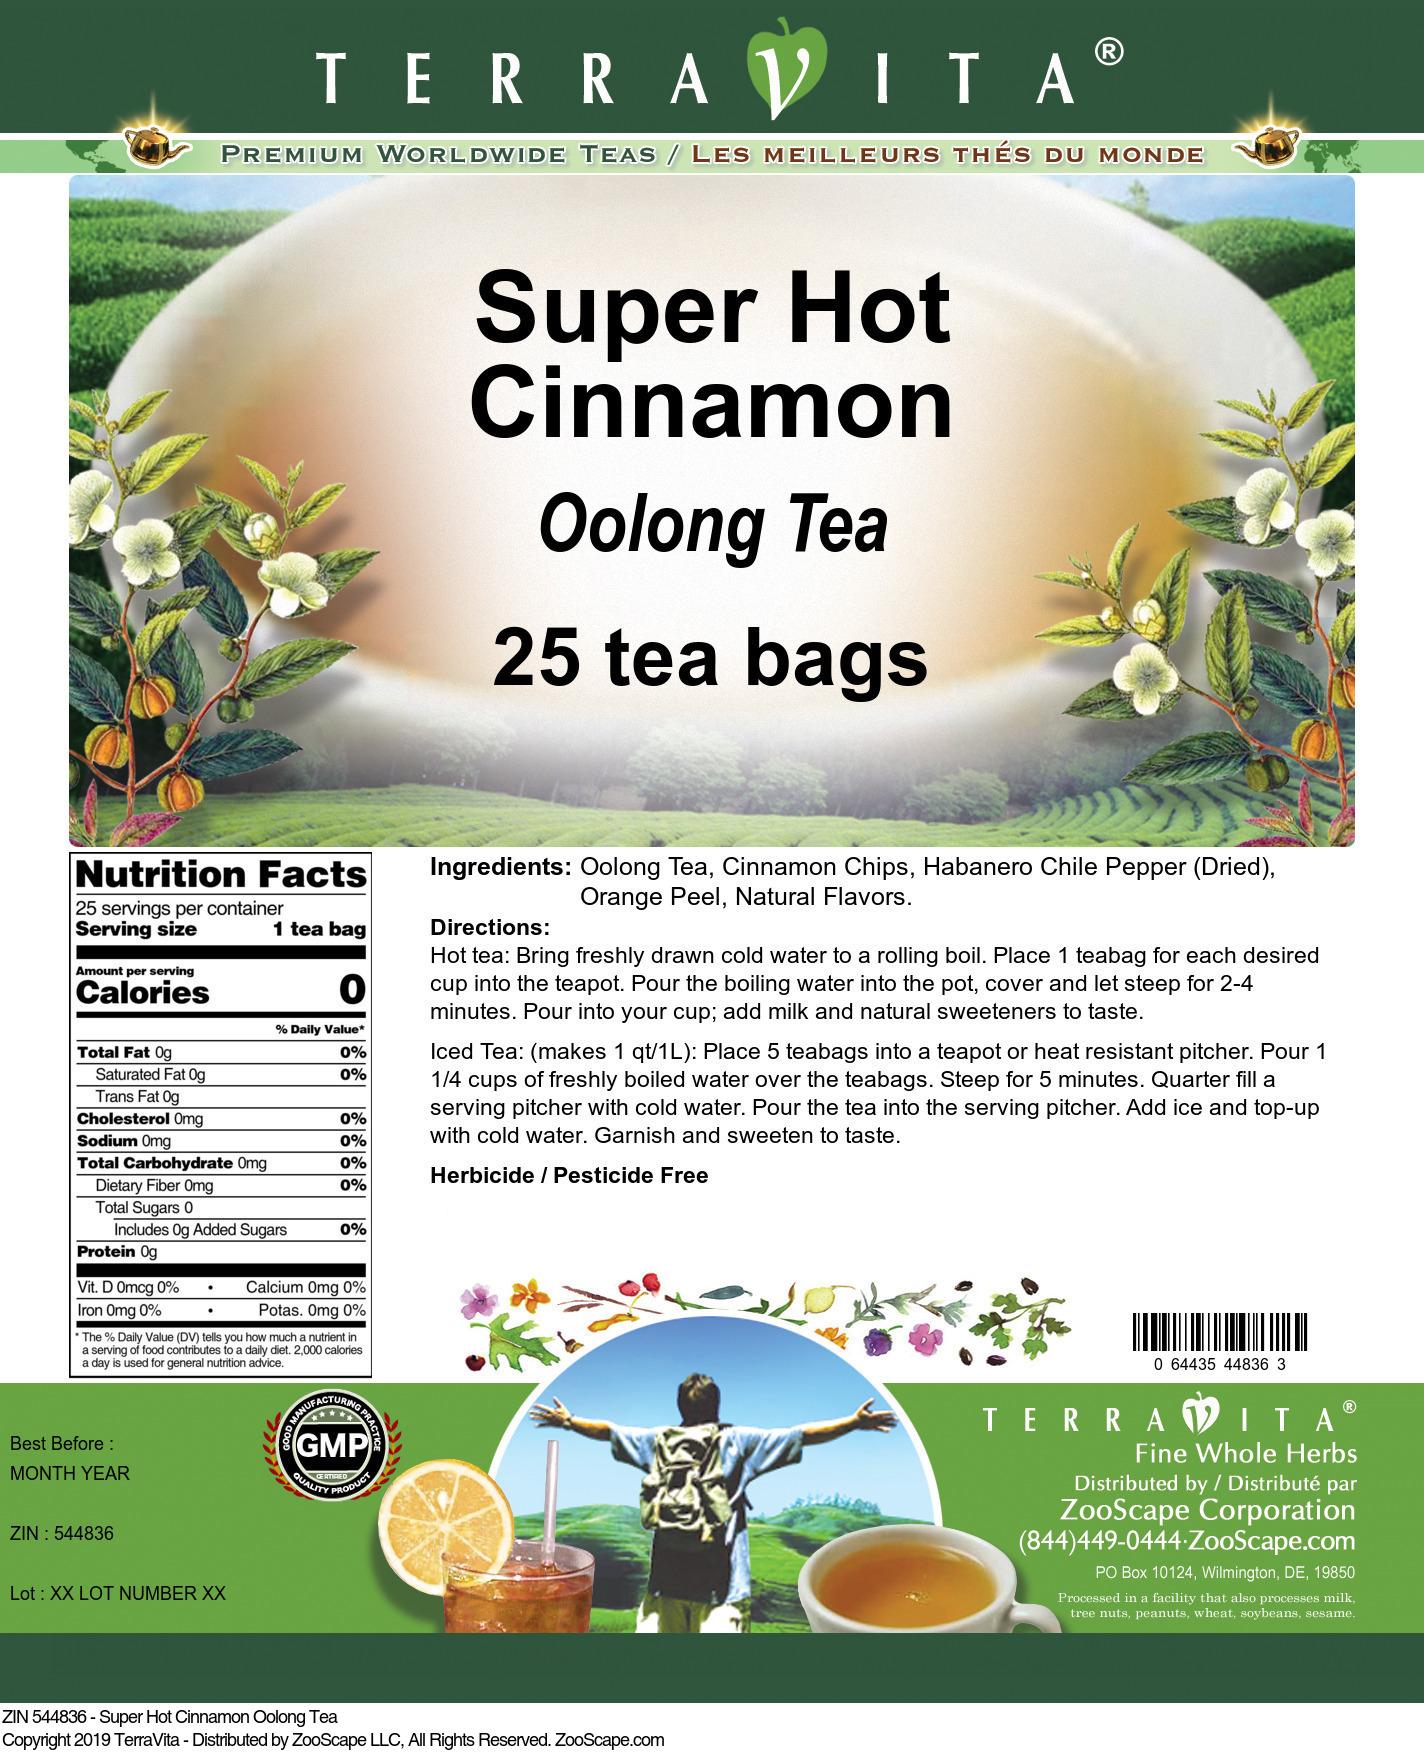 Super Hot Cinnamon Oolong Tea